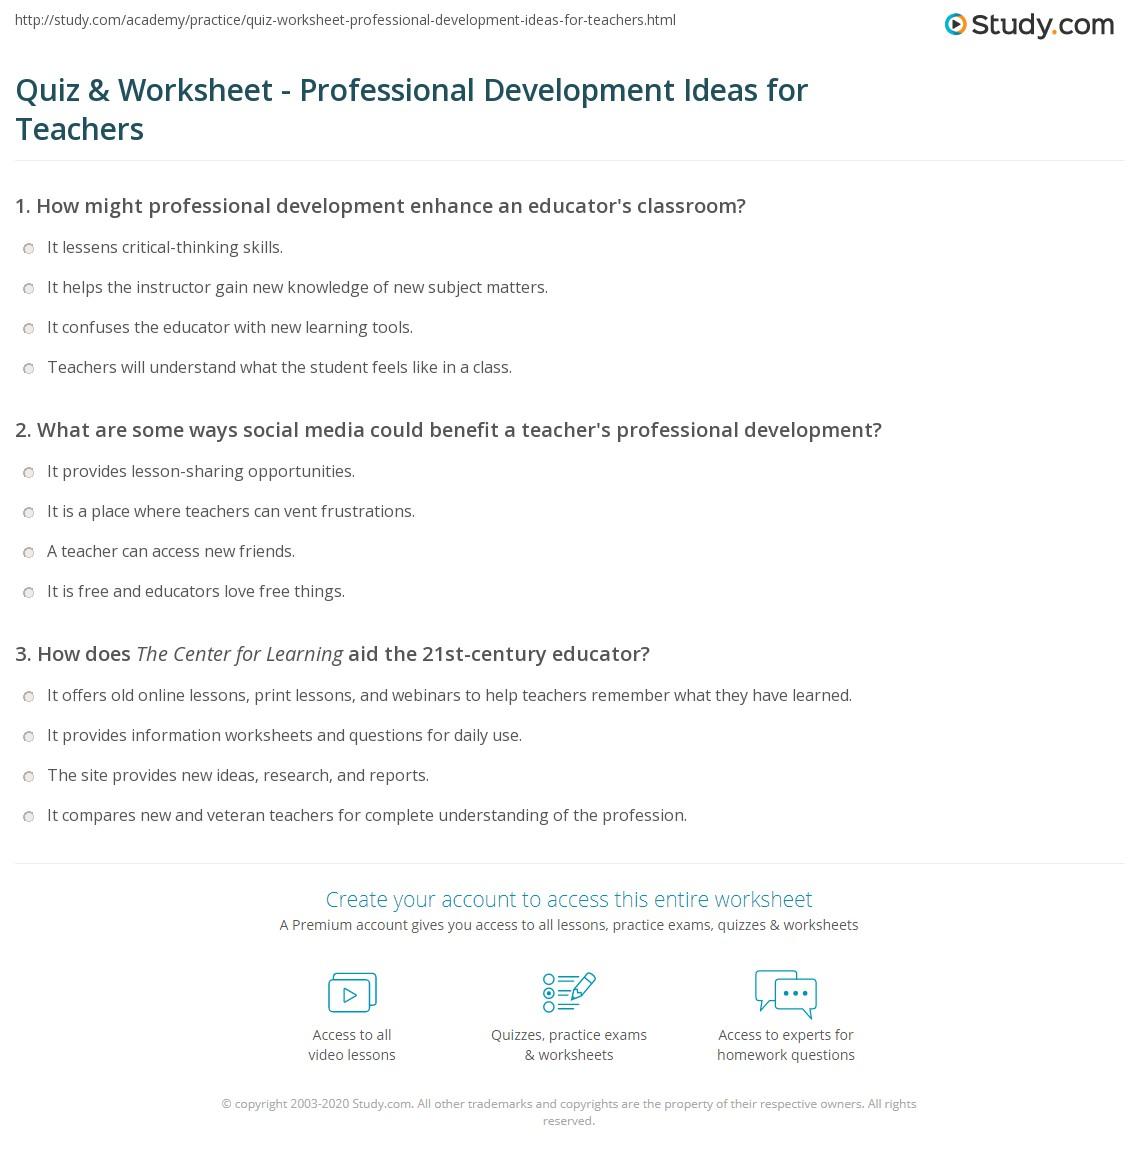 quiz & worksheet - professional development ideas for teachers